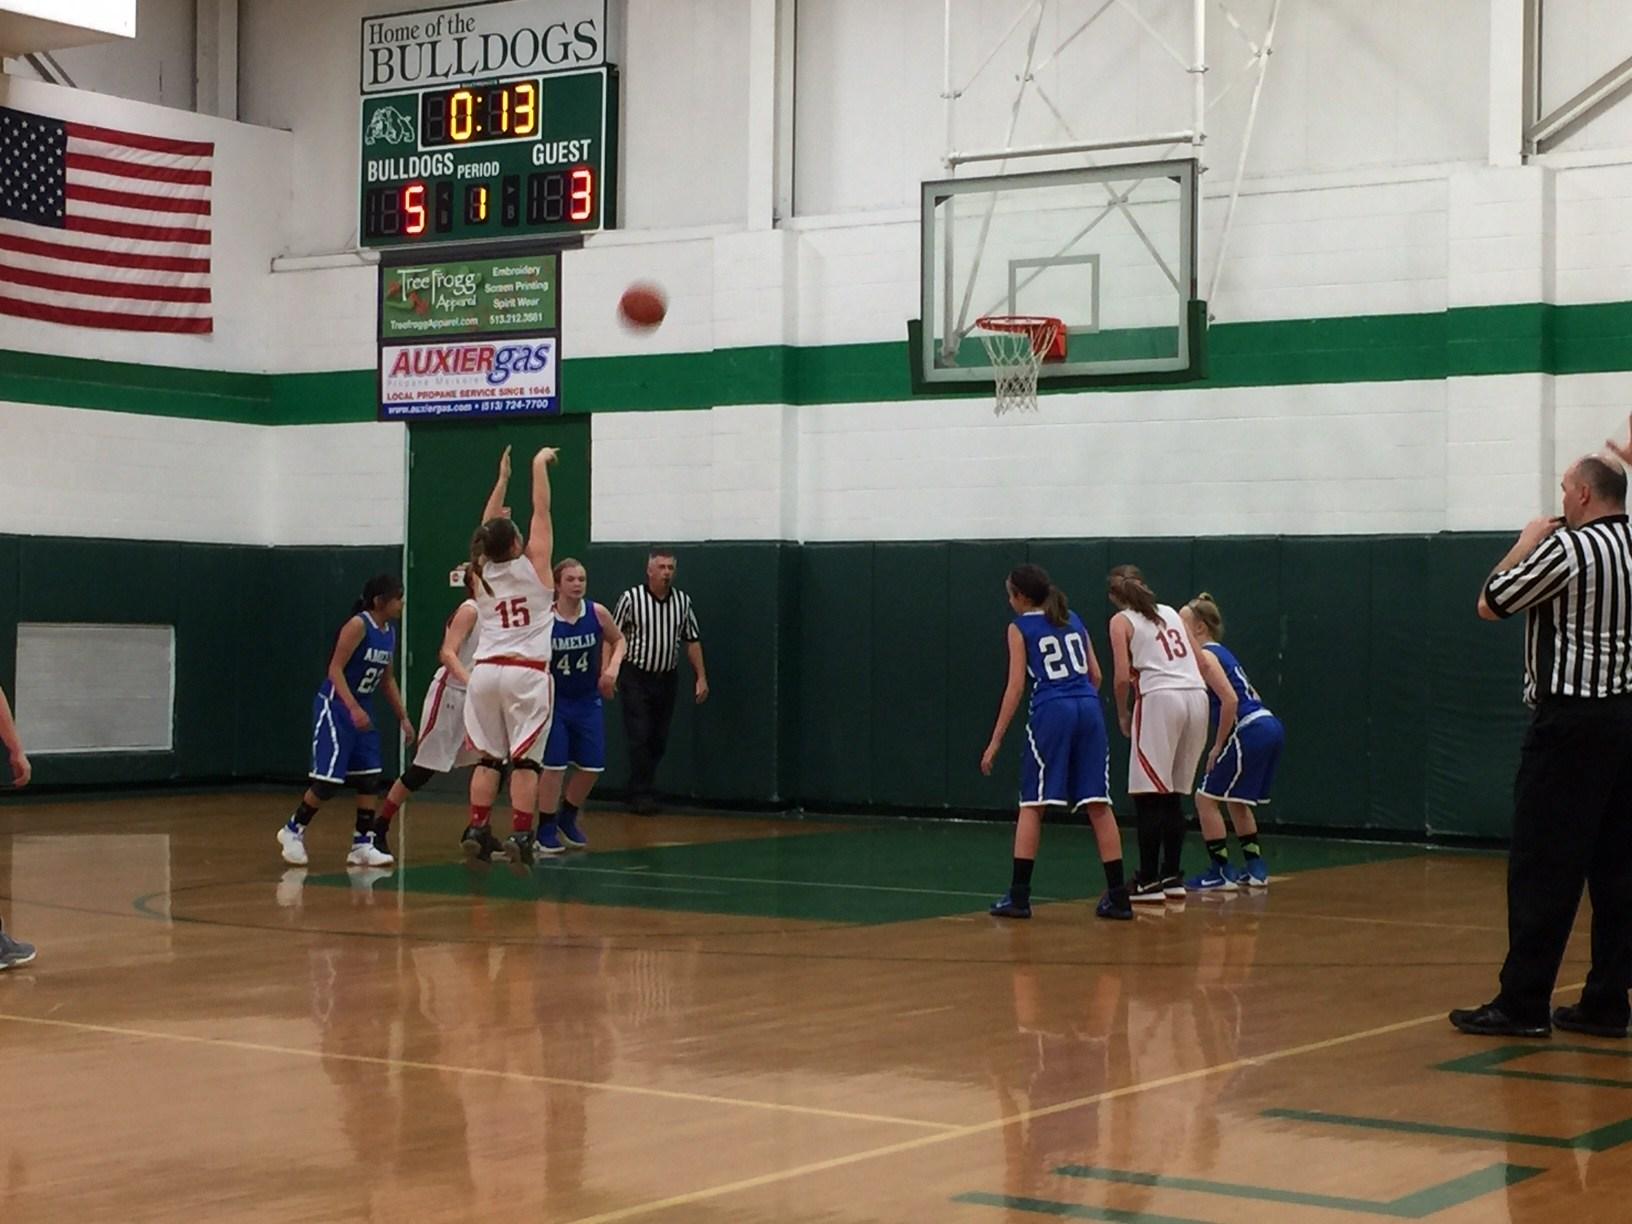 7th grade girls basketball players